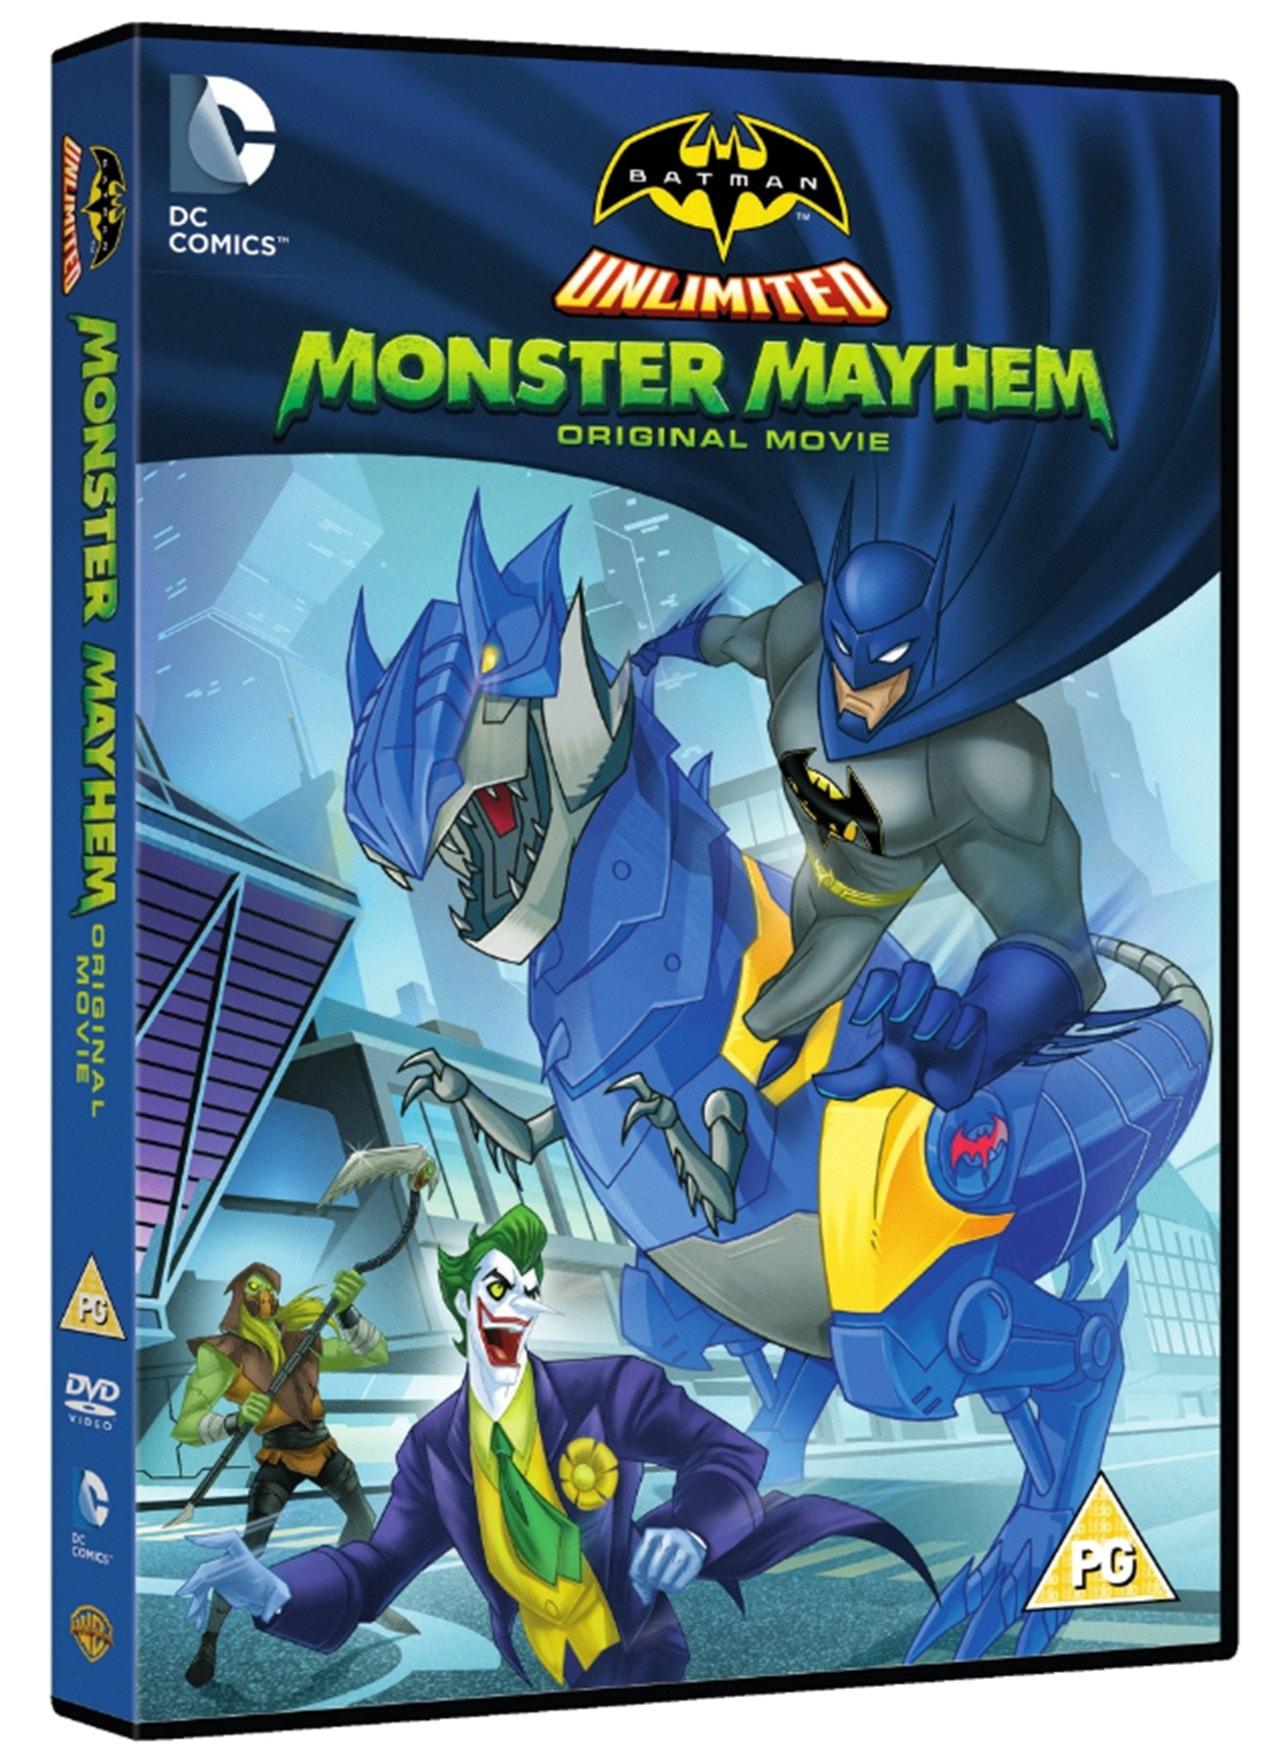 Batman Unlimited: Monster Mayhem - 2